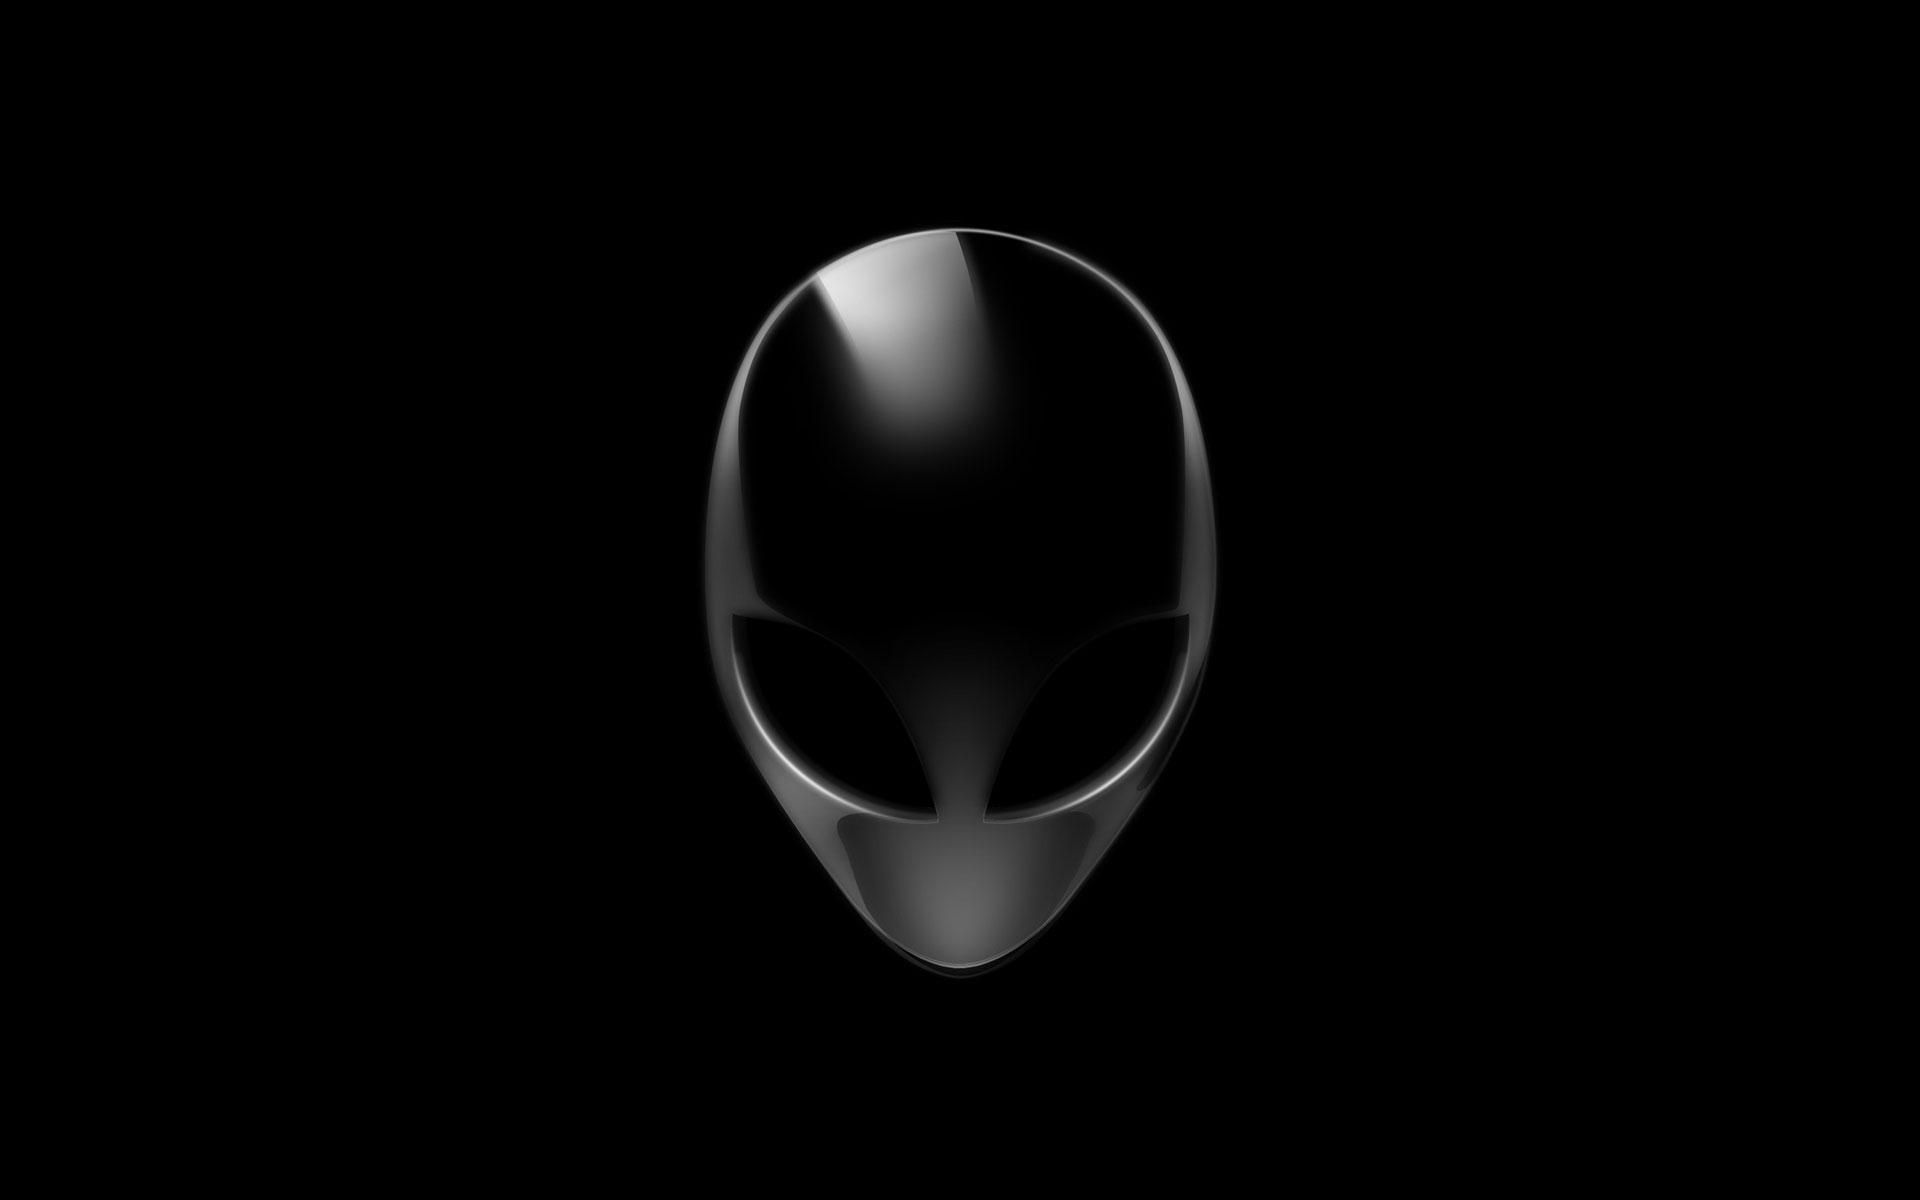 dell alienware wallpaper hd